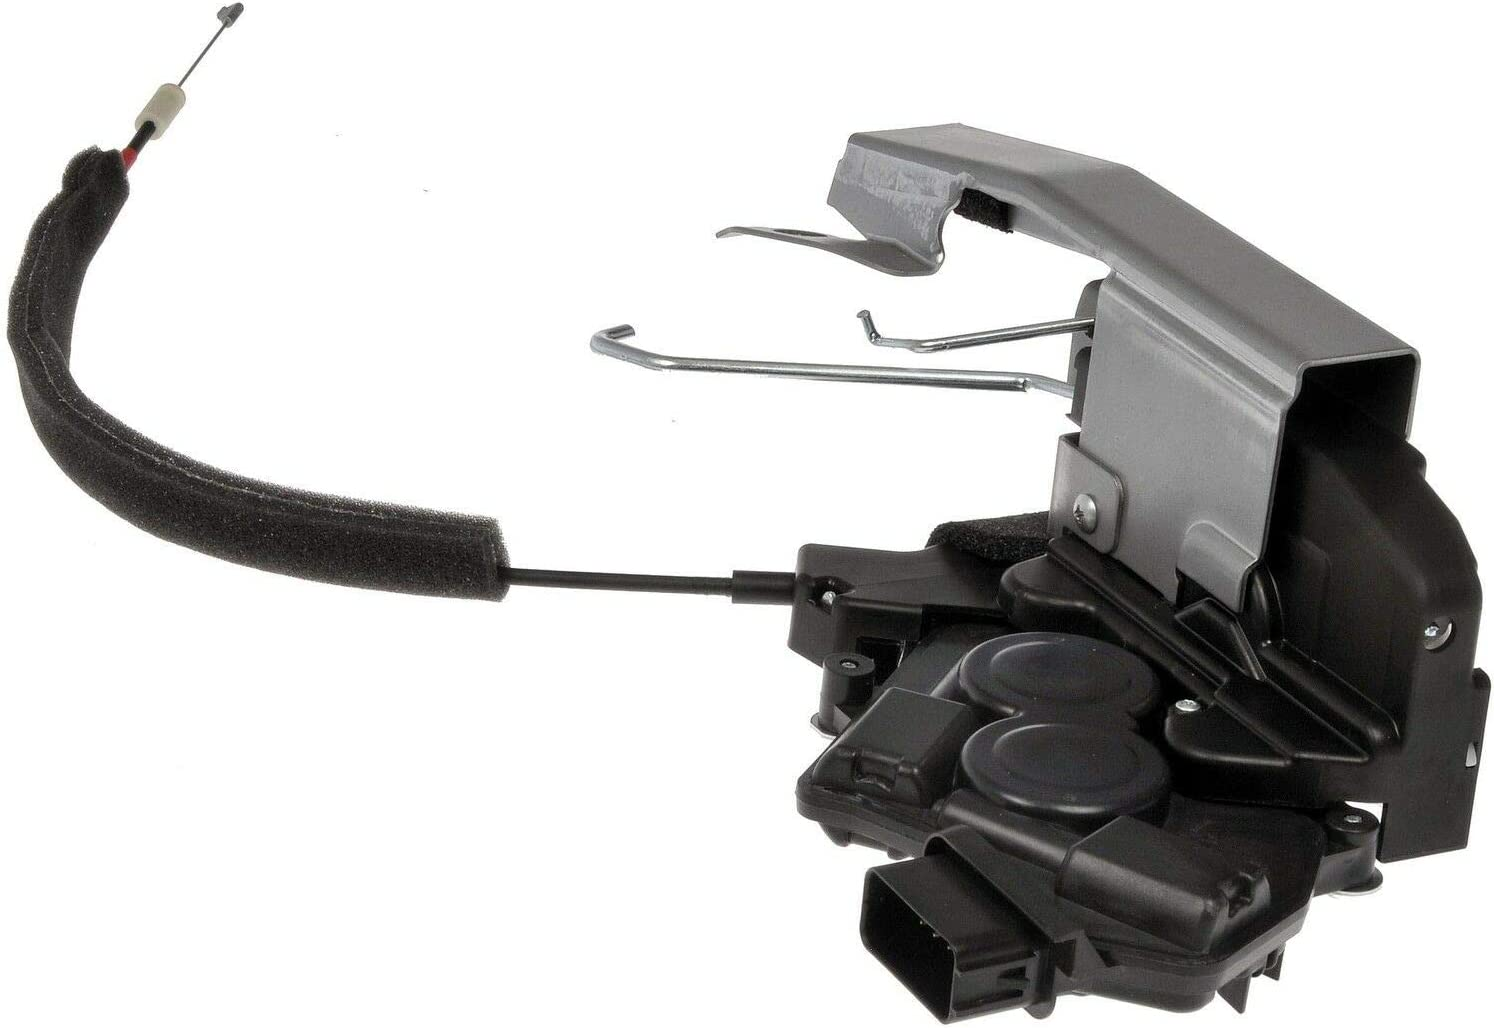 Dorman 937-700 Front Driver Side Door Lock Actuator Motor for Select Mazda Models